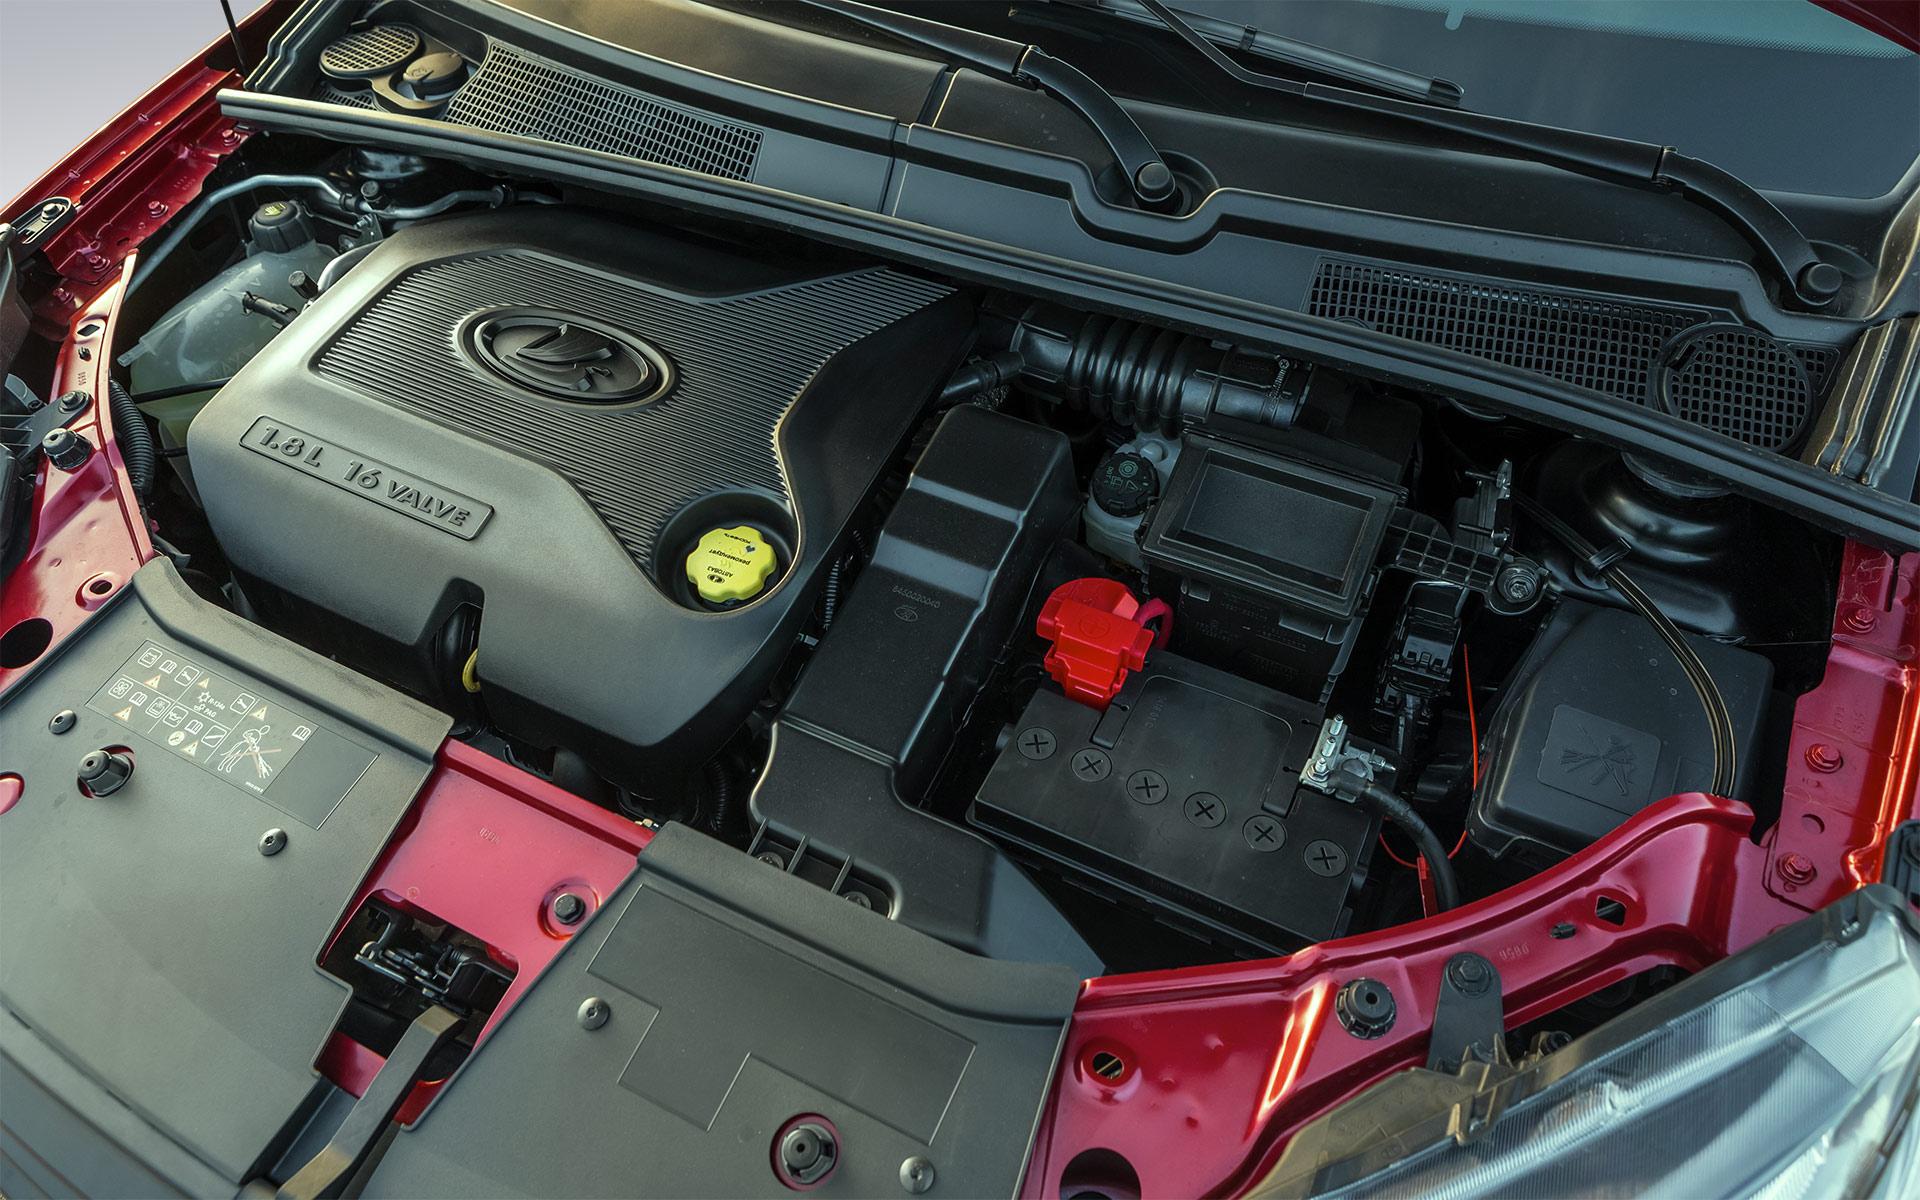 Lada Xray: technical specifications. Lada Xray: engine performance